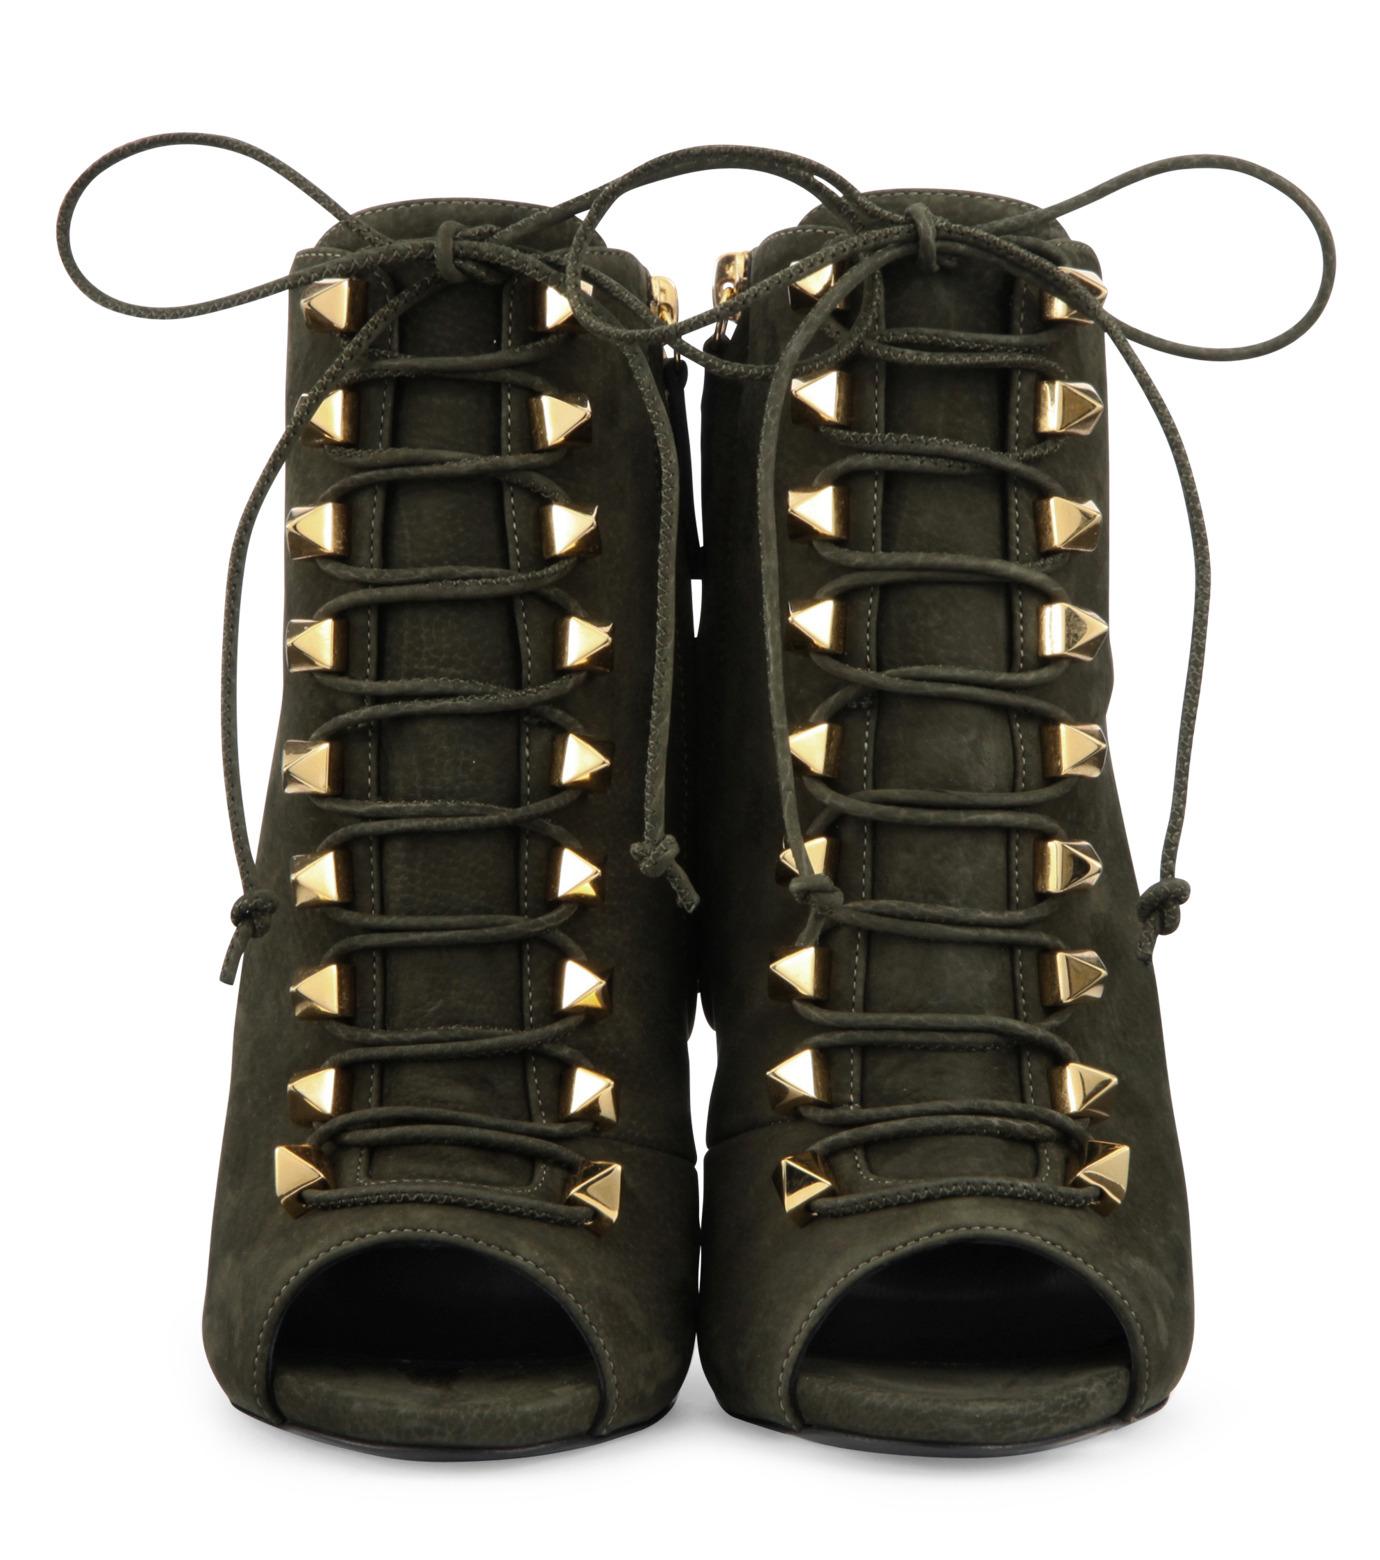 Giuseppe Zanotti Design(ジュゼッペザノッティ)のLace Up Bootie-KHAKI(ブーツ/boots)-32-7032AP115-24 拡大詳細画像4